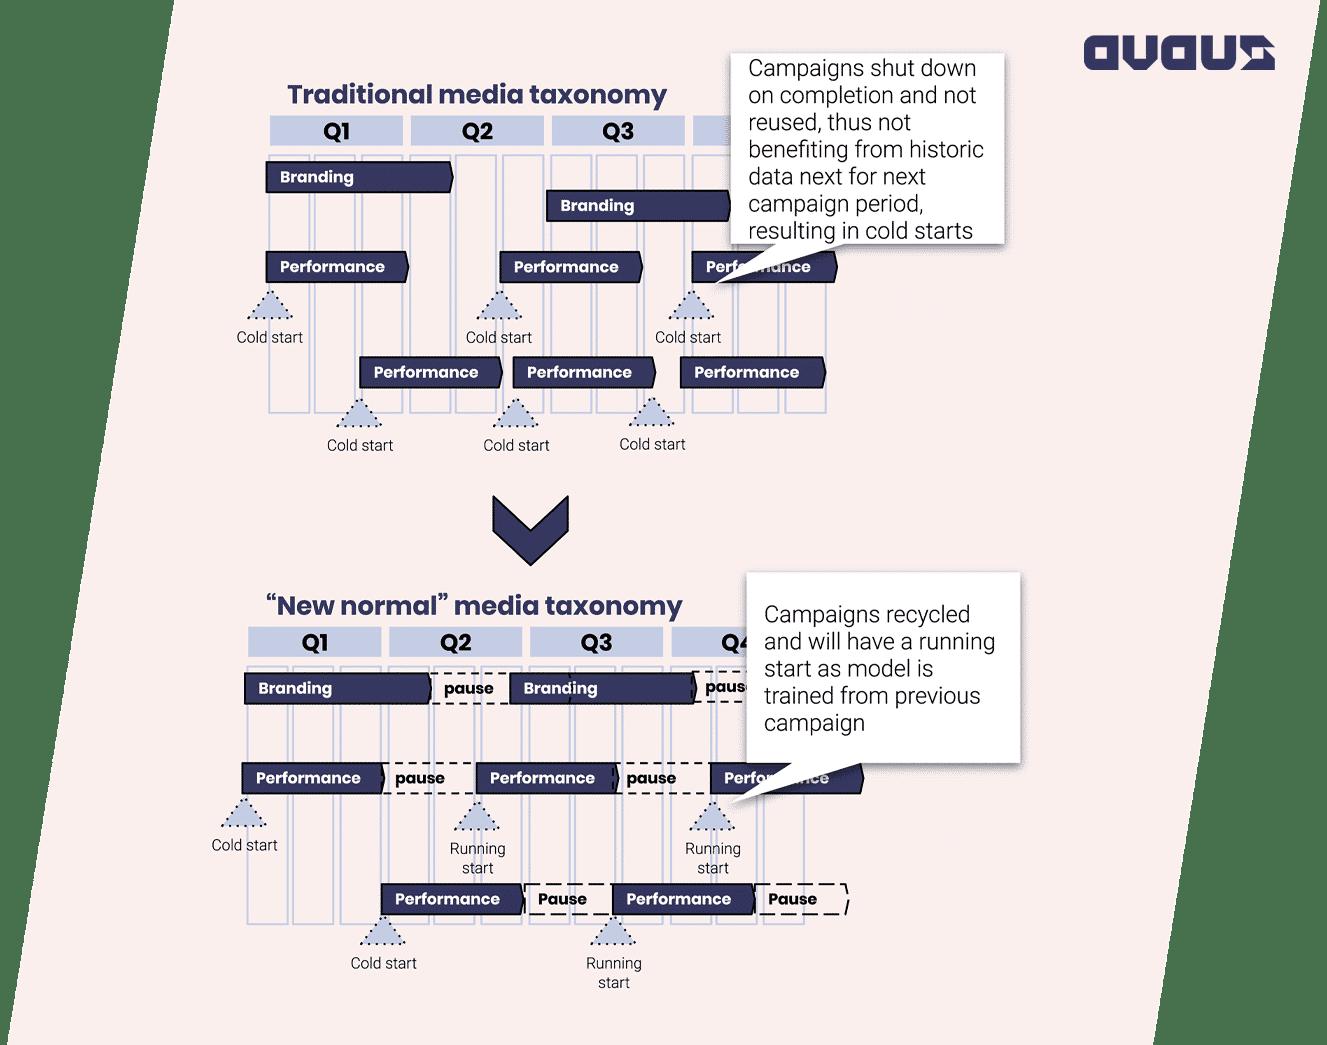 traditional_media_taxonomy_vs_new_normal